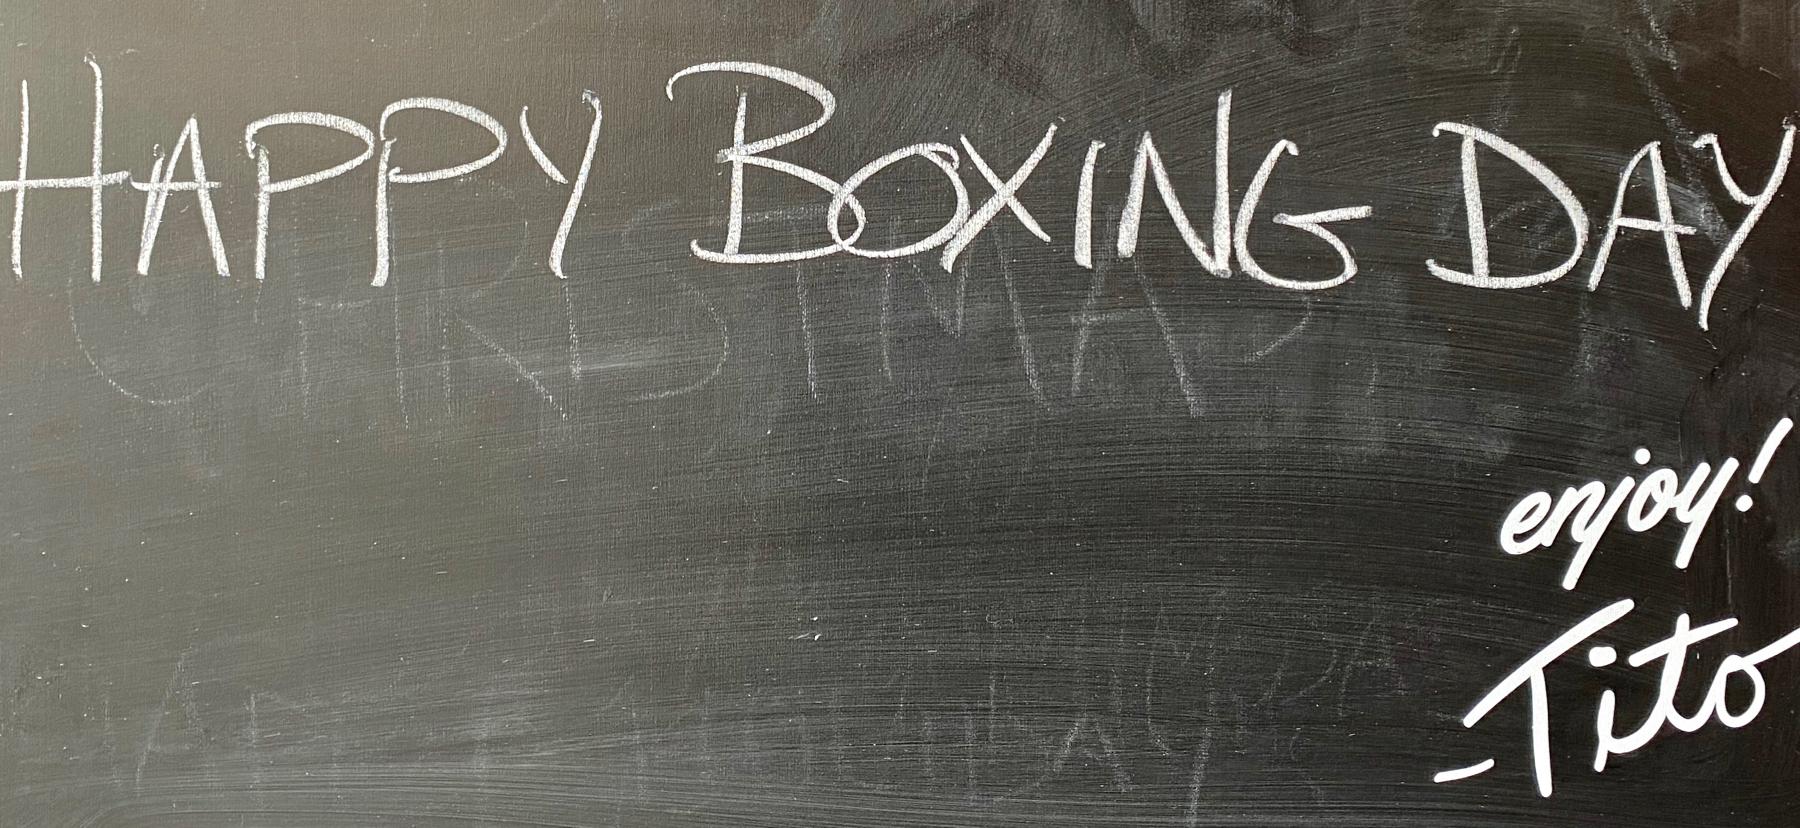 H boxing d